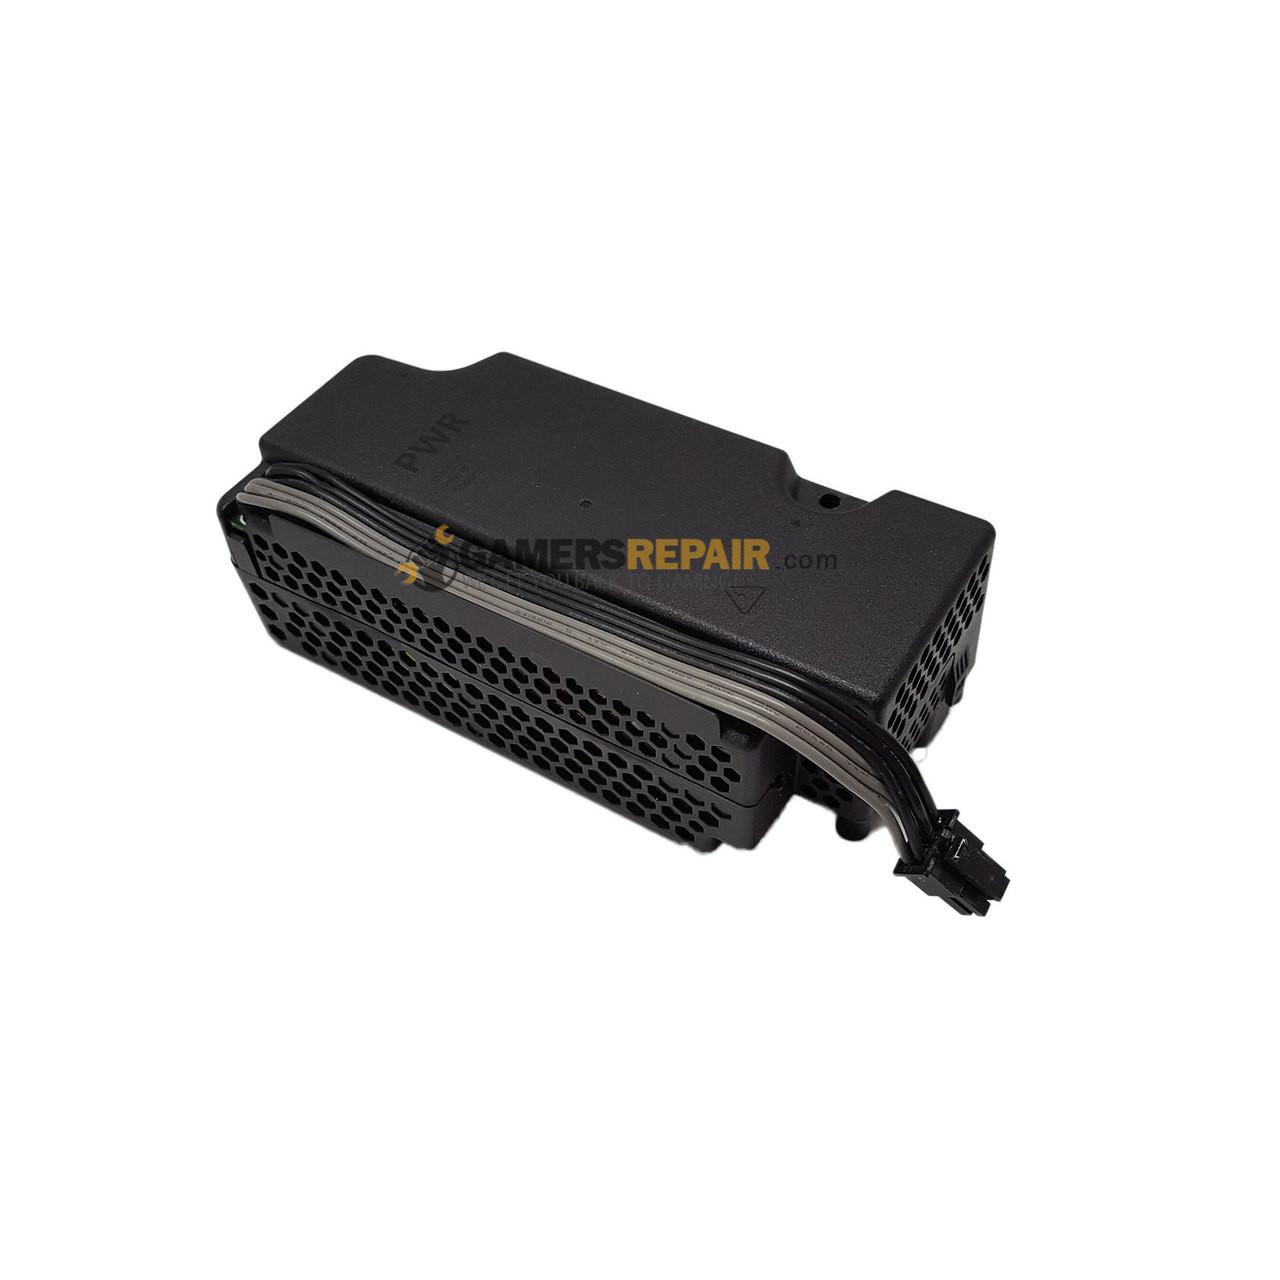 oem power supply pa 1131 13mx for xbox one s slim  [ 1280 x 1280 Pixel ]